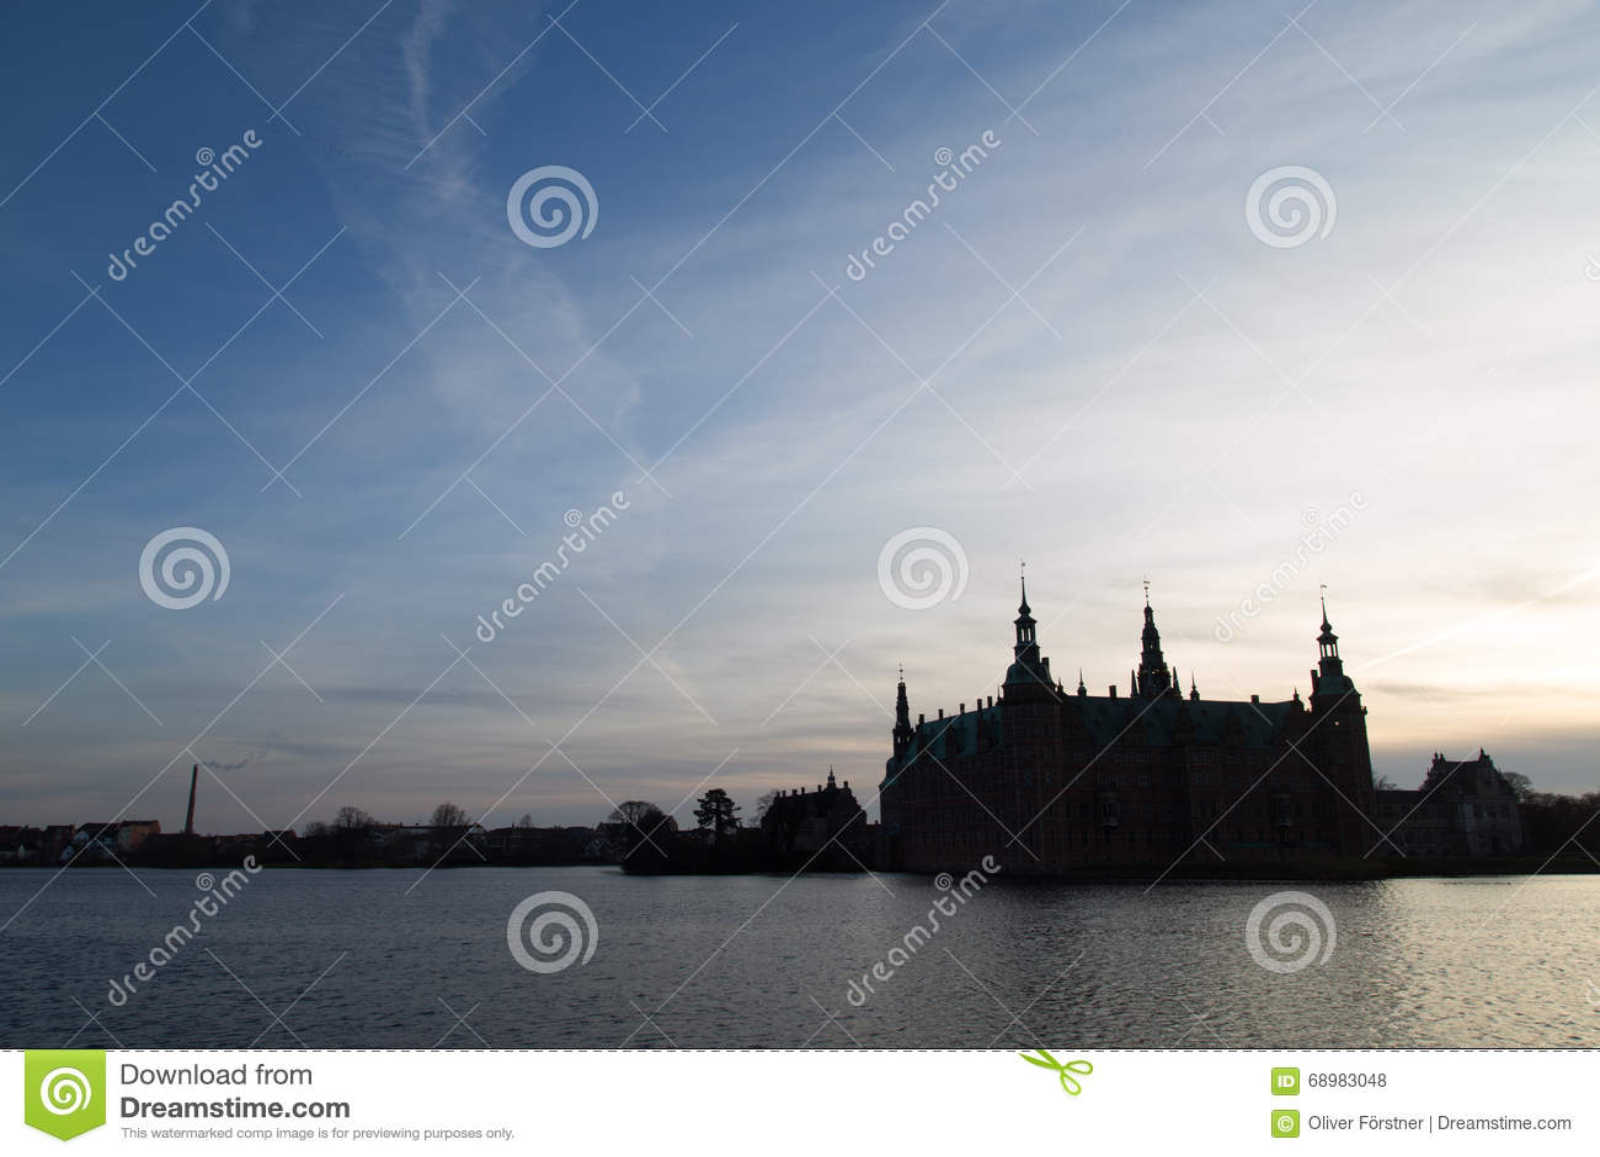 Silueta del castillo de Frederiksborg, Dinamarca